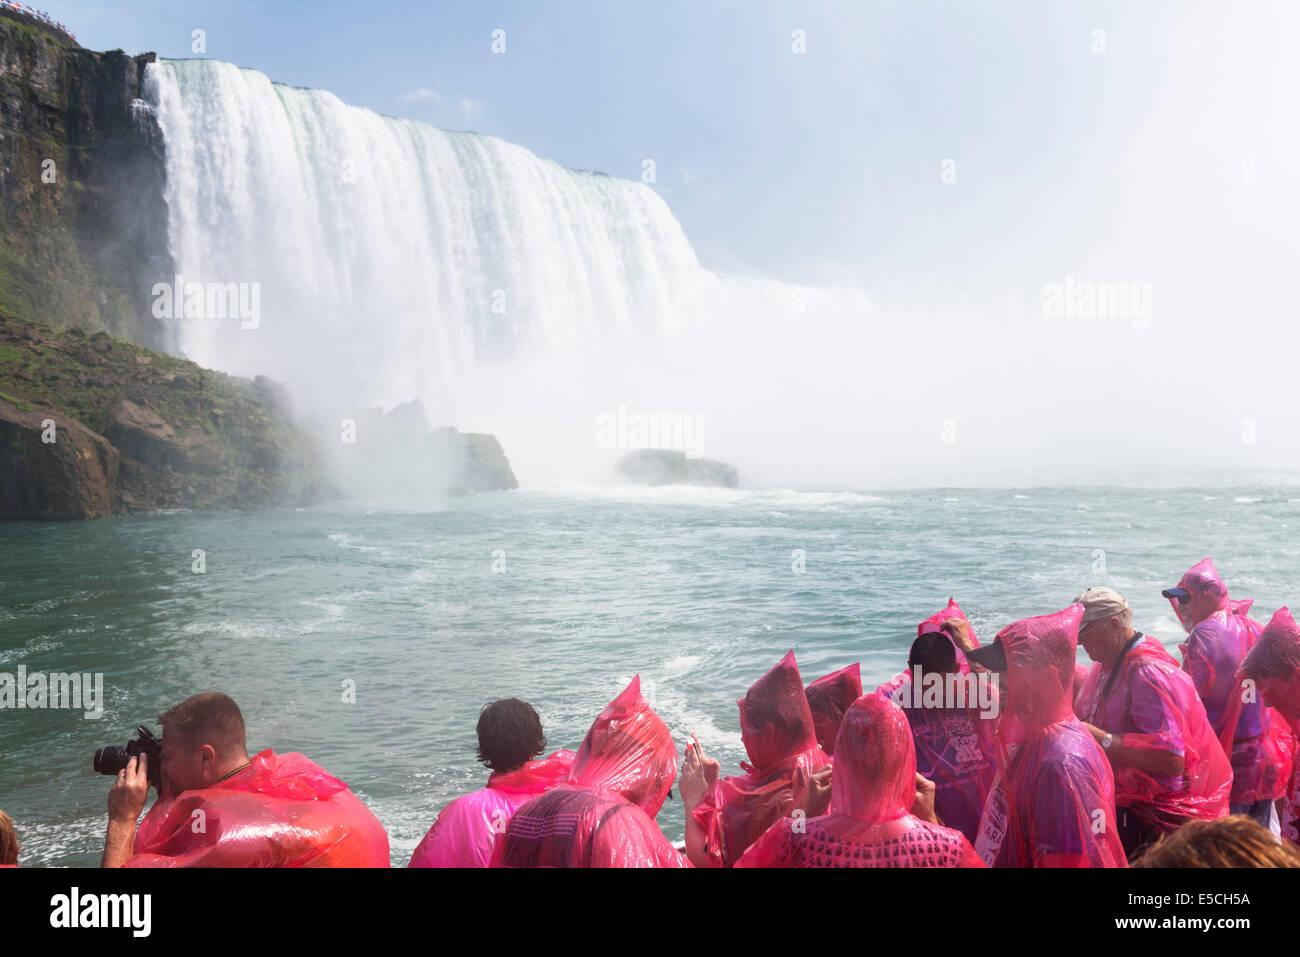 Niagara Falls boat ride. Hornblower Niagara Cruises, Ontario, Canada 2014. - Stock Image